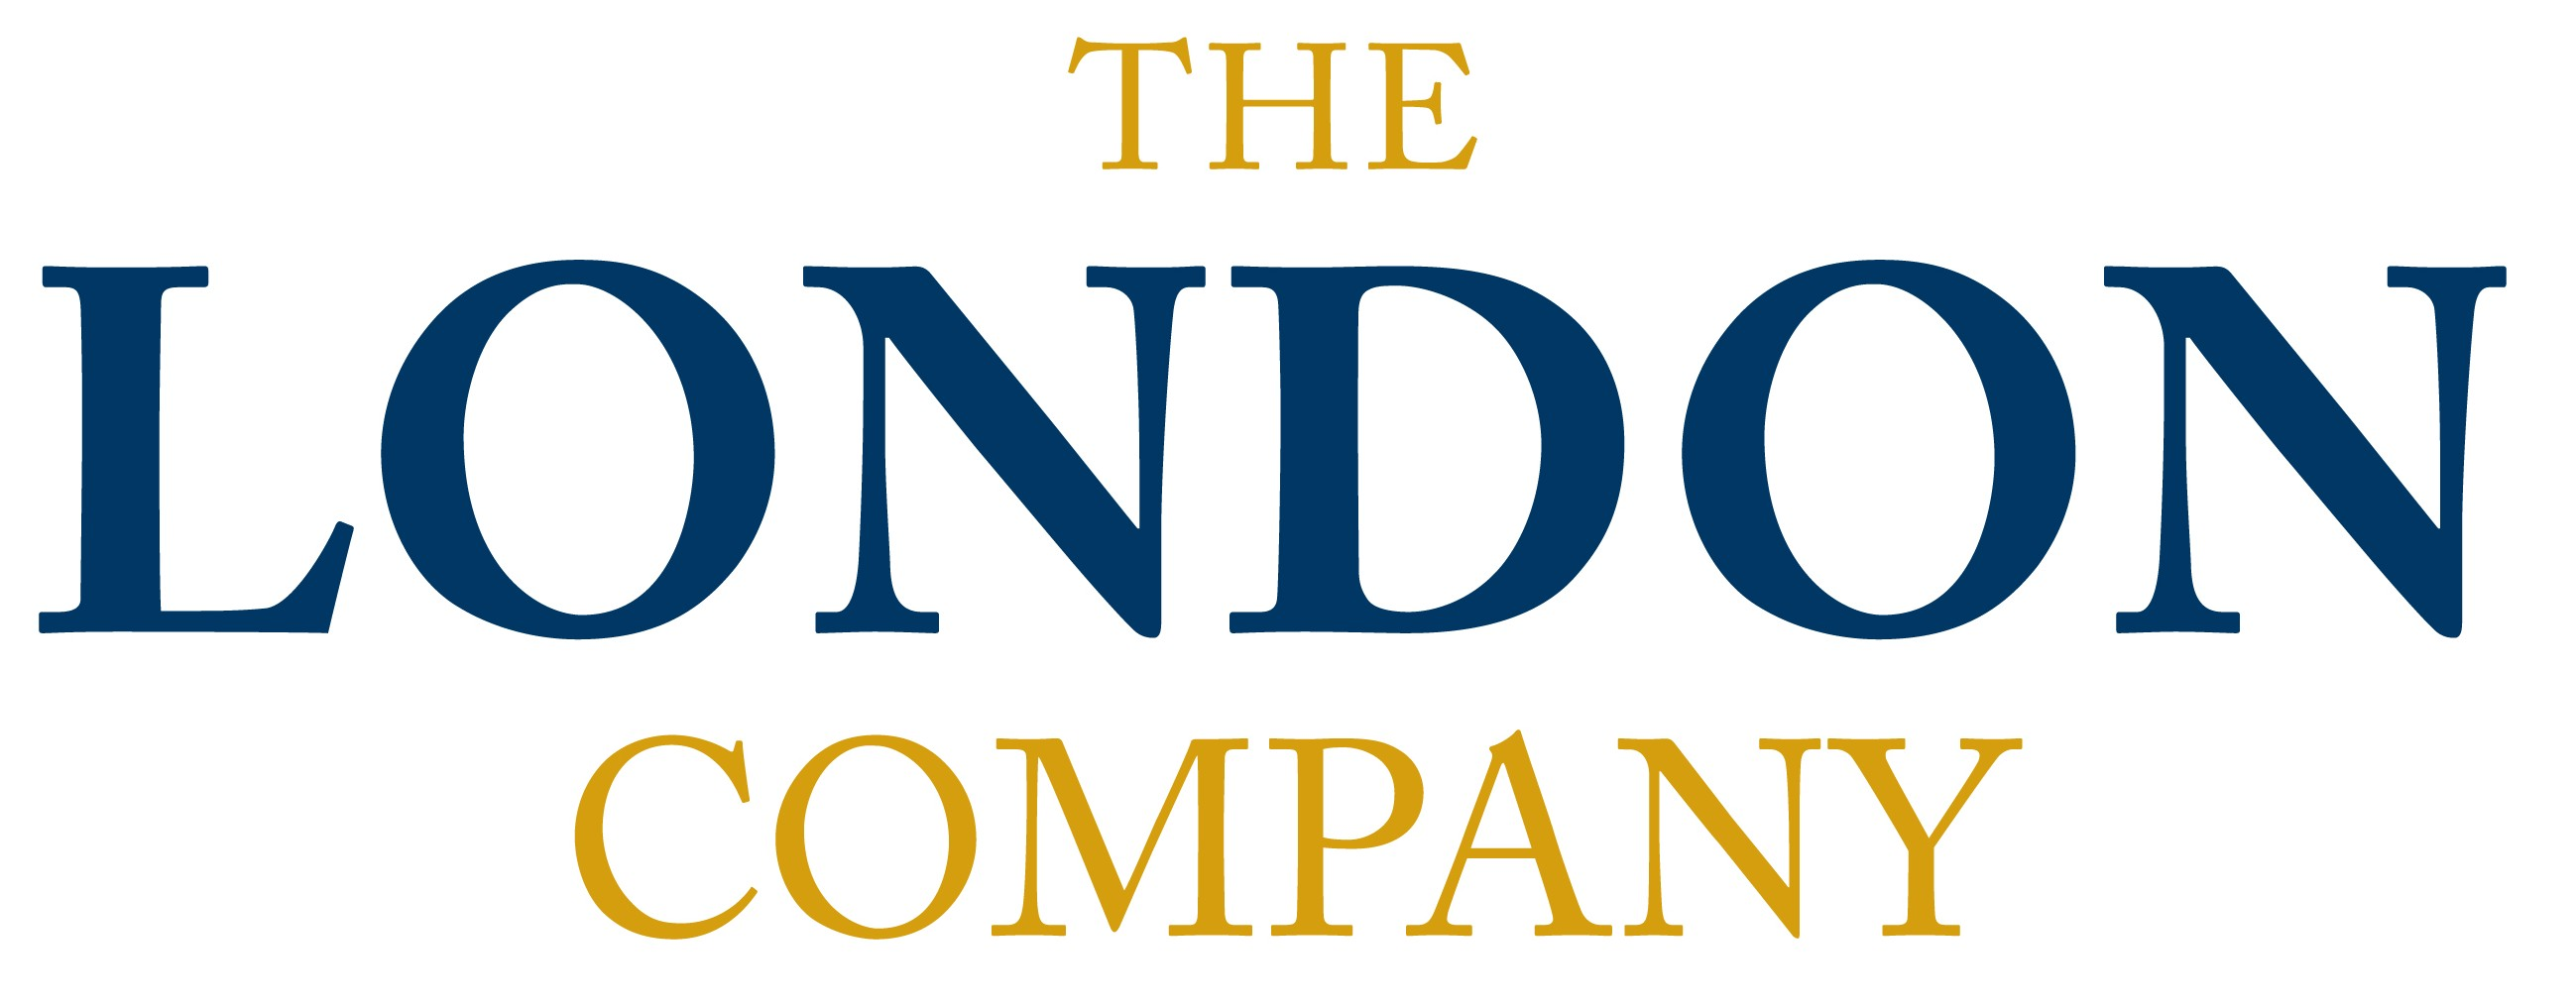 thelondoncompany_logo_2color_rgb